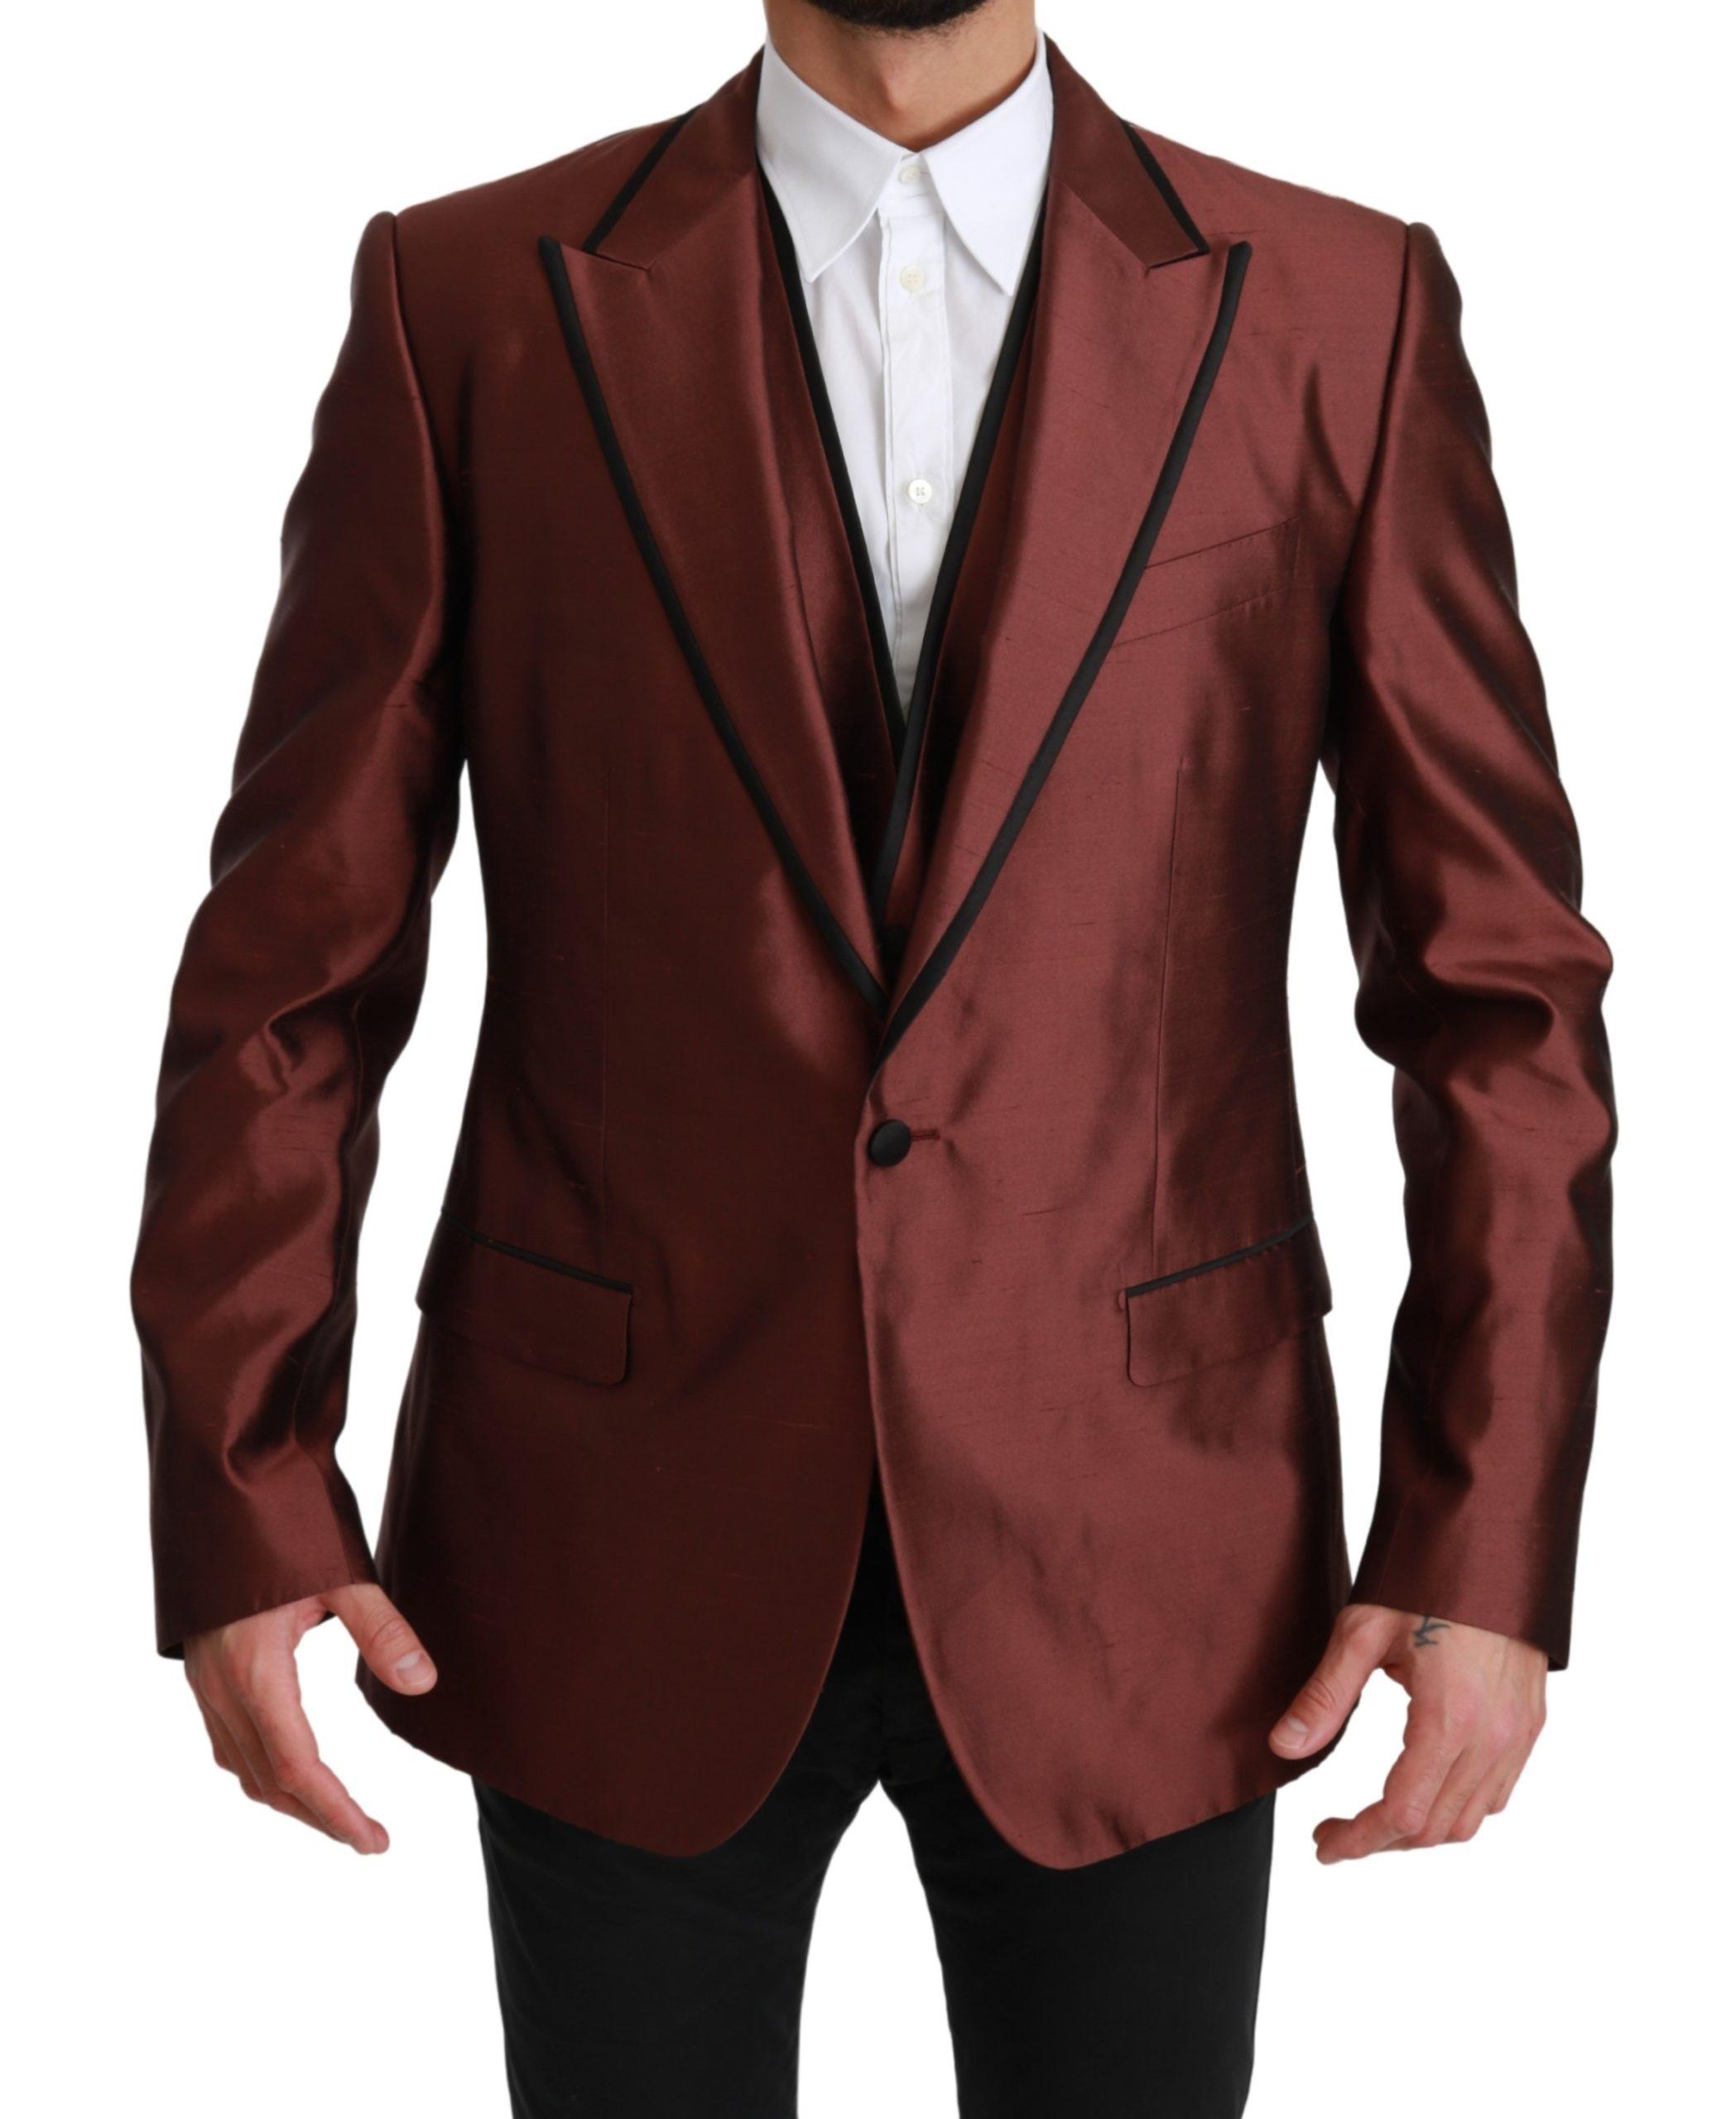 Dolce & Gabbana Men's Silk Vest 2 Piece Blazer Bordeaux KOS1663 - IT52 | XL